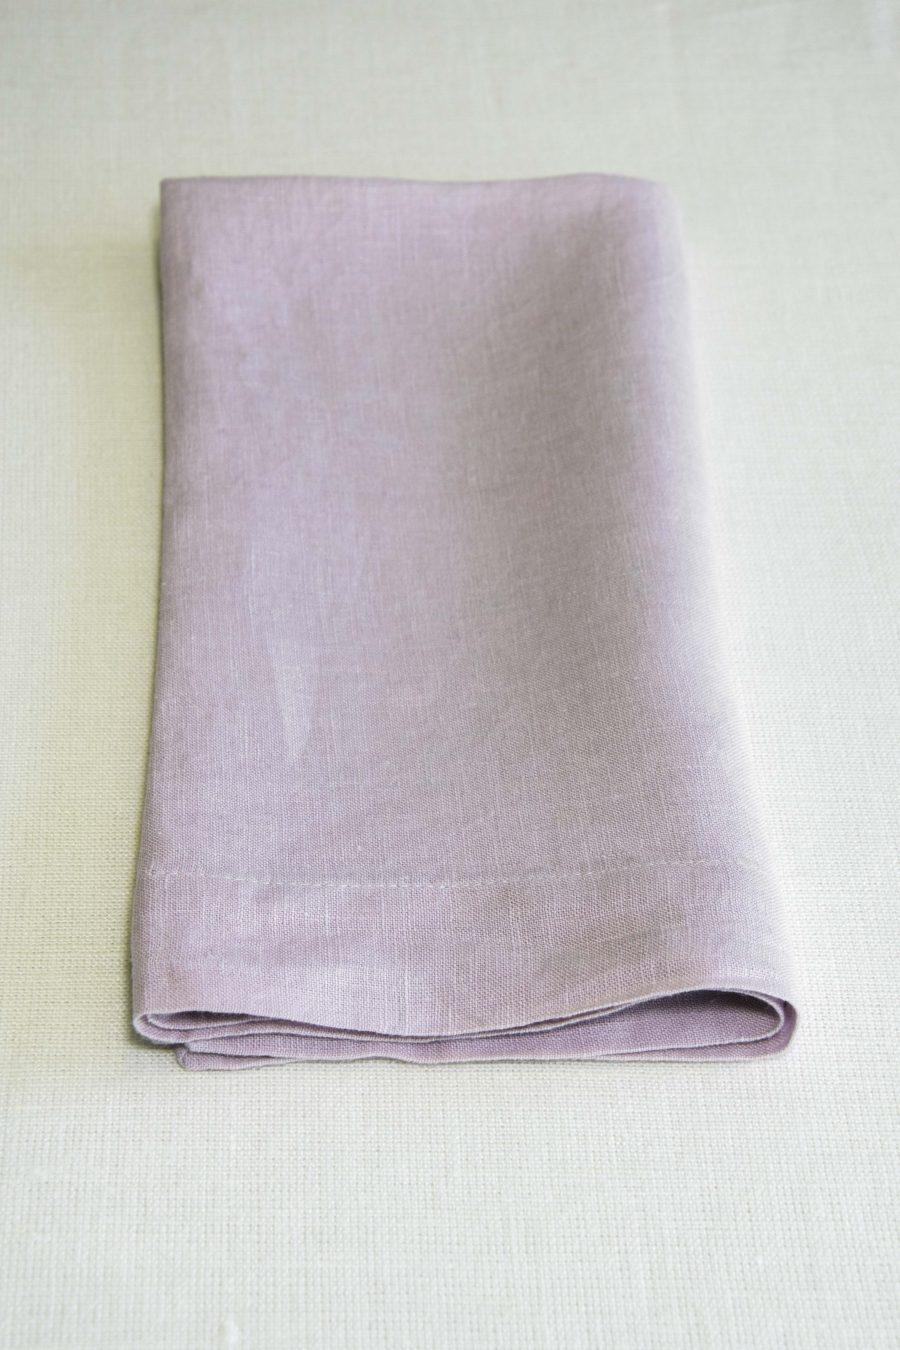 napkin-light-pink-900x1350.jpg